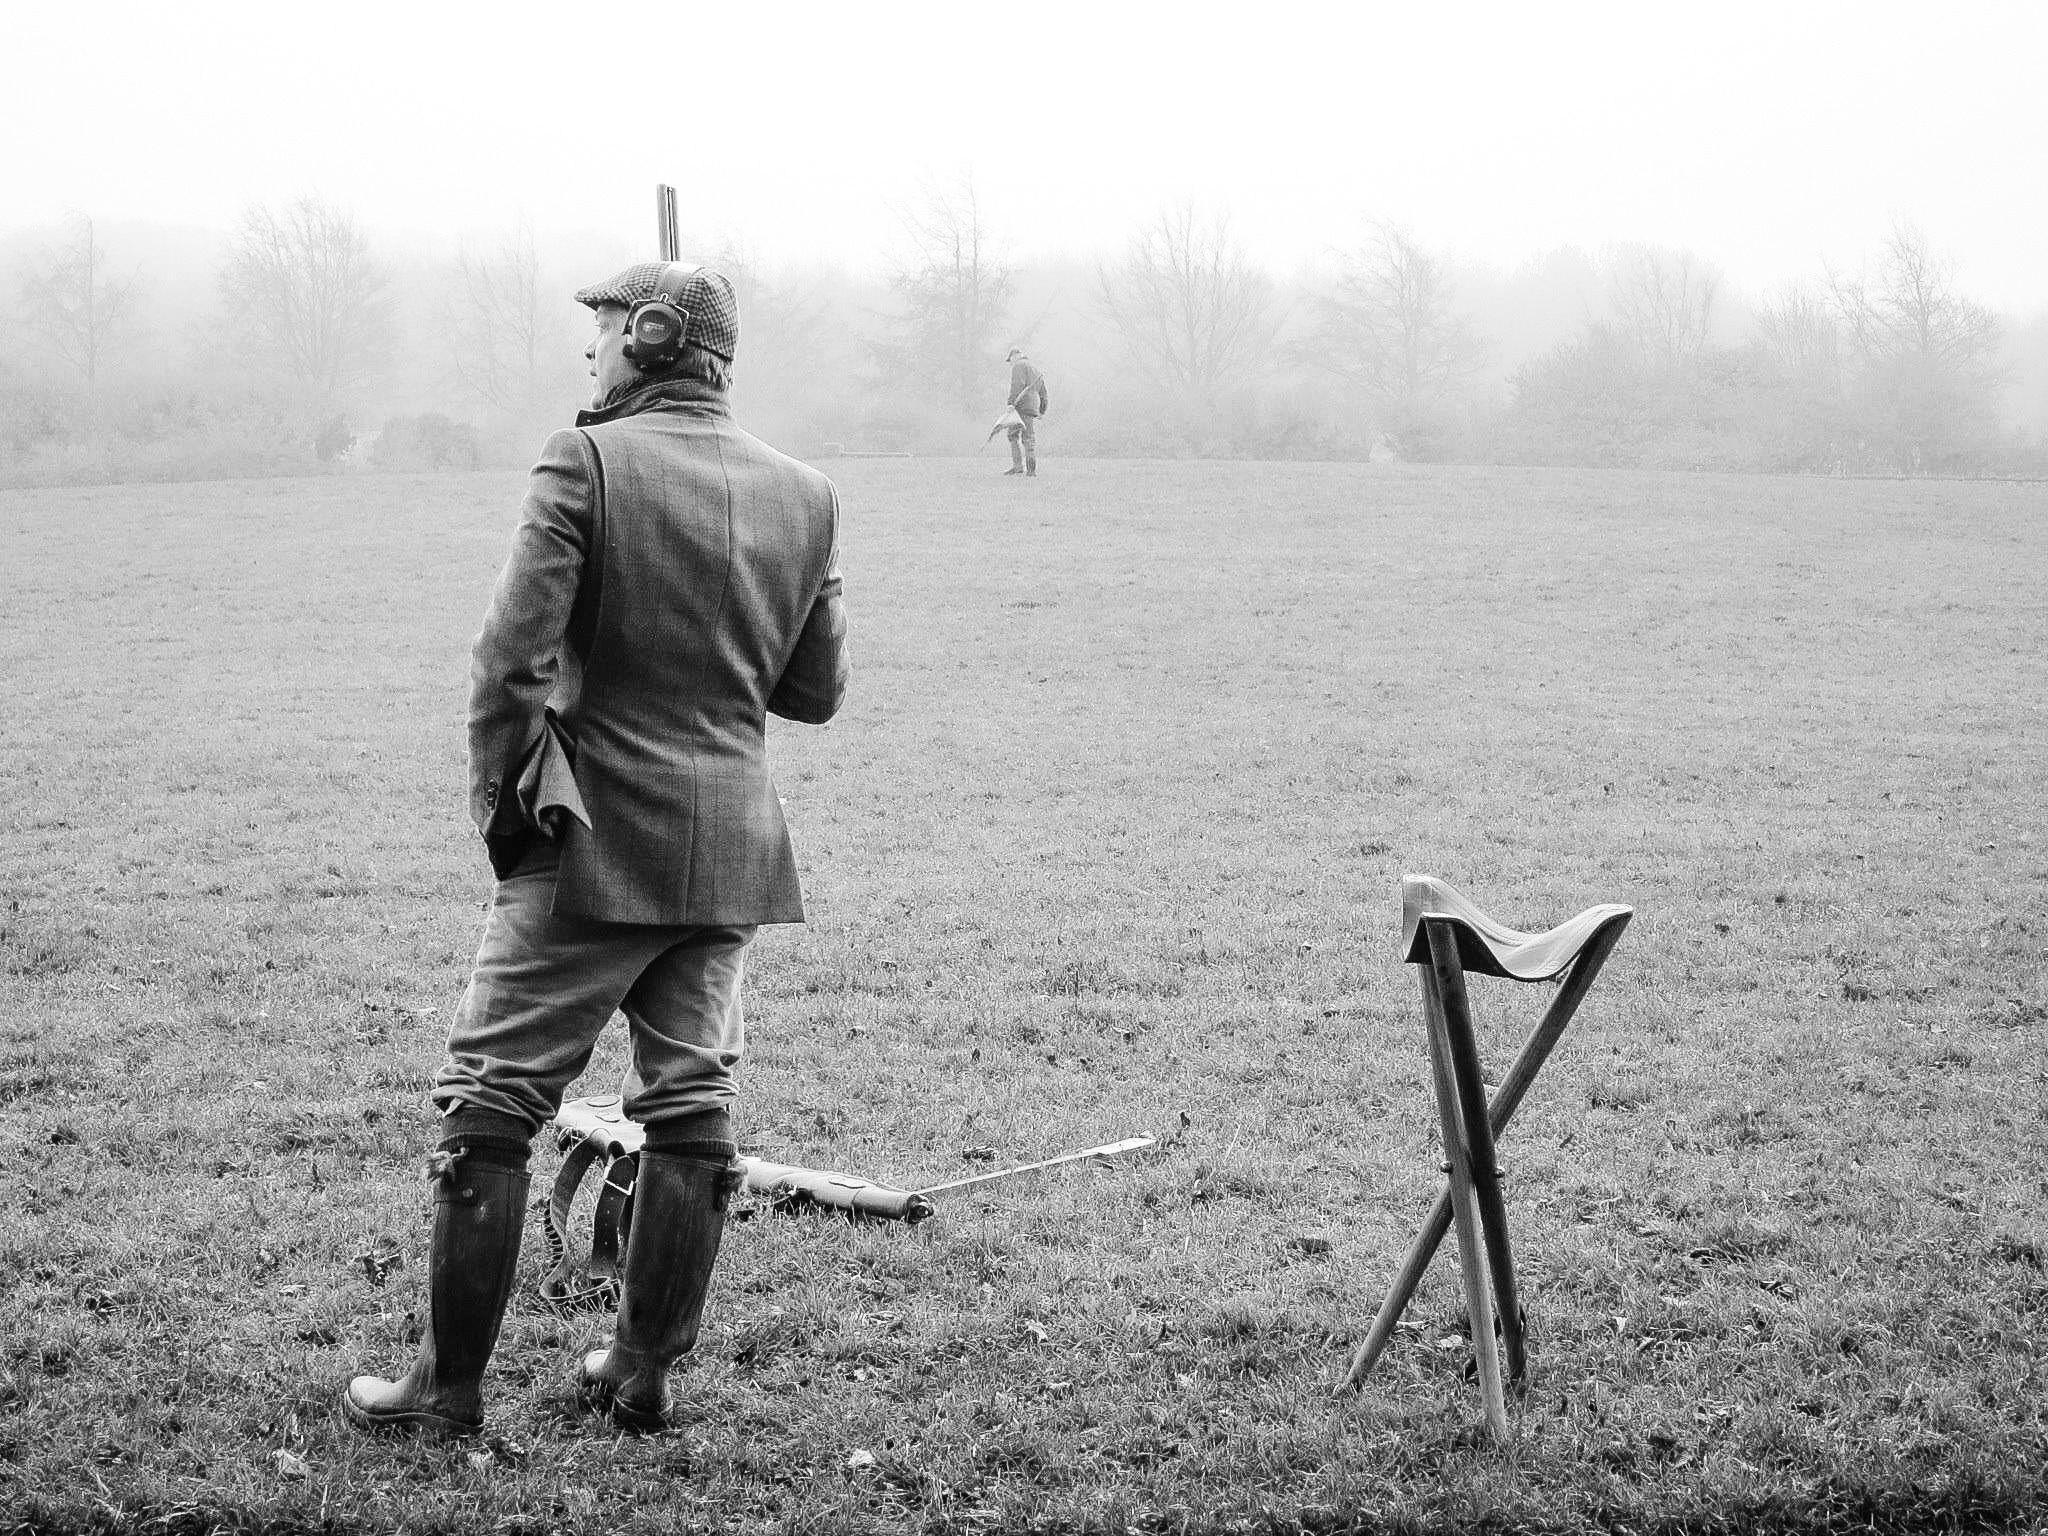 Pheasant shoot Pheasant shooting, Hunting life, Country life